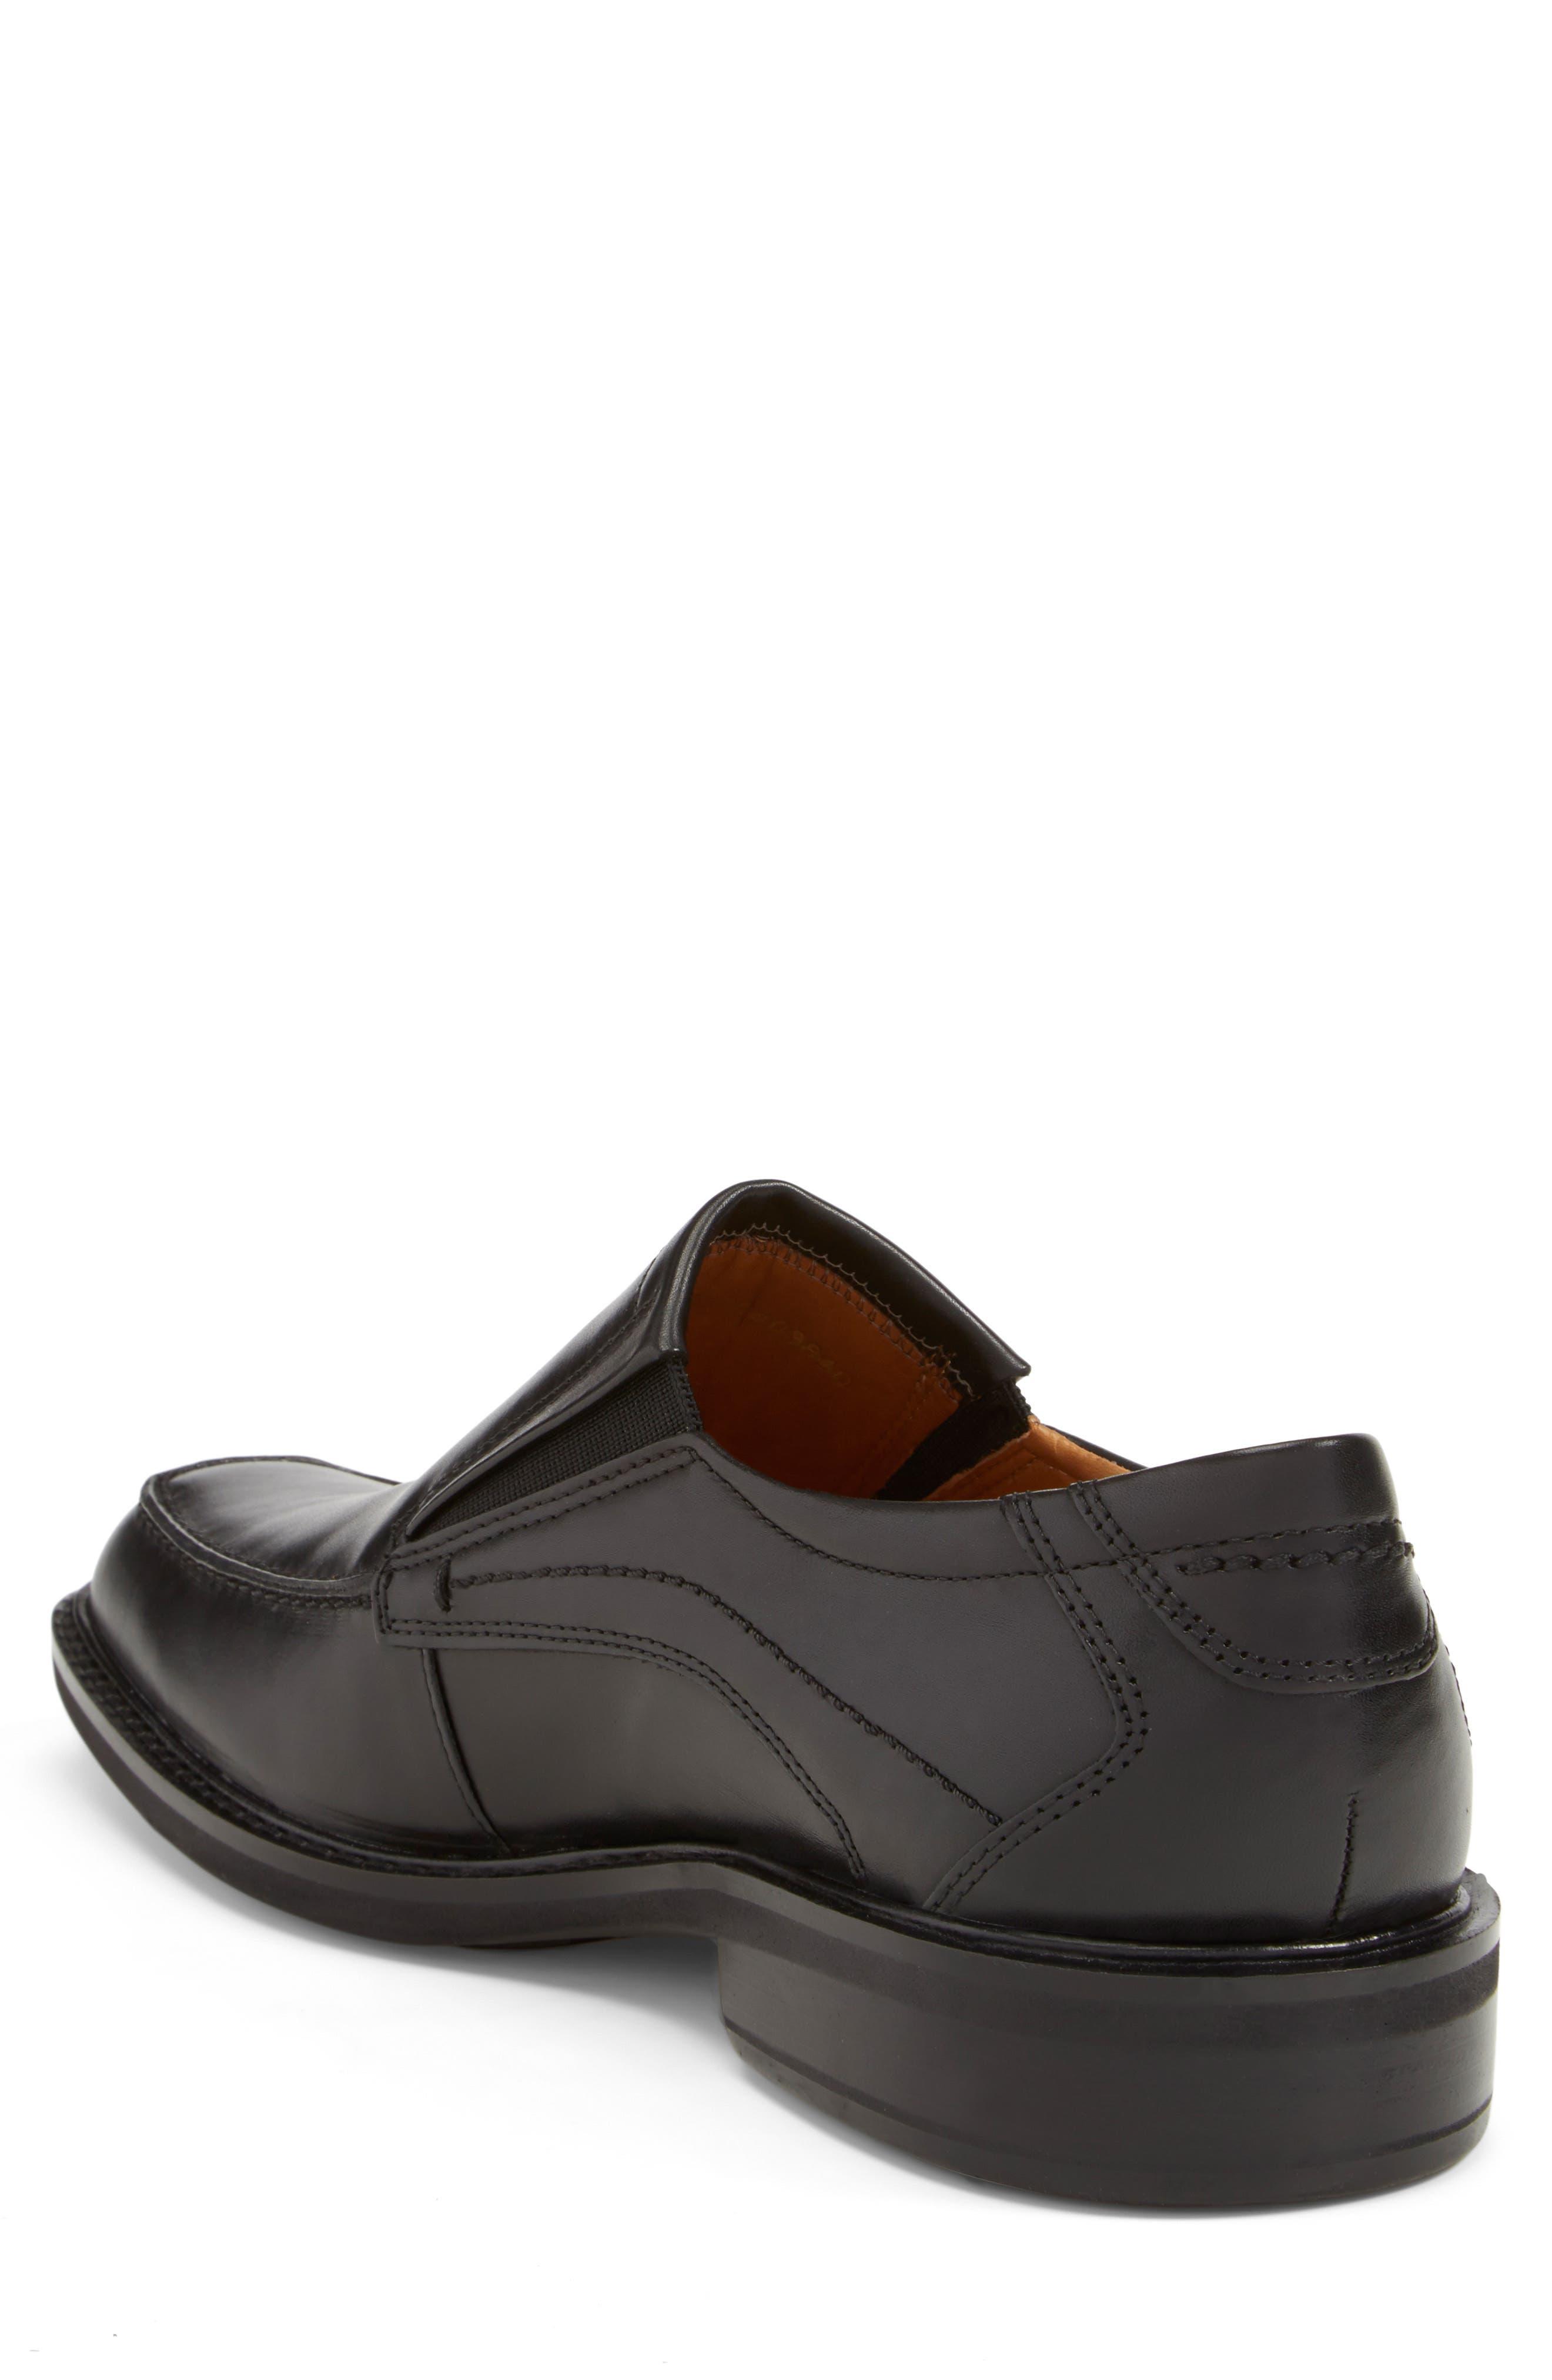 'Windsor' Slip-On,                             Alternate thumbnail 2, color,                             Black/Black Leather